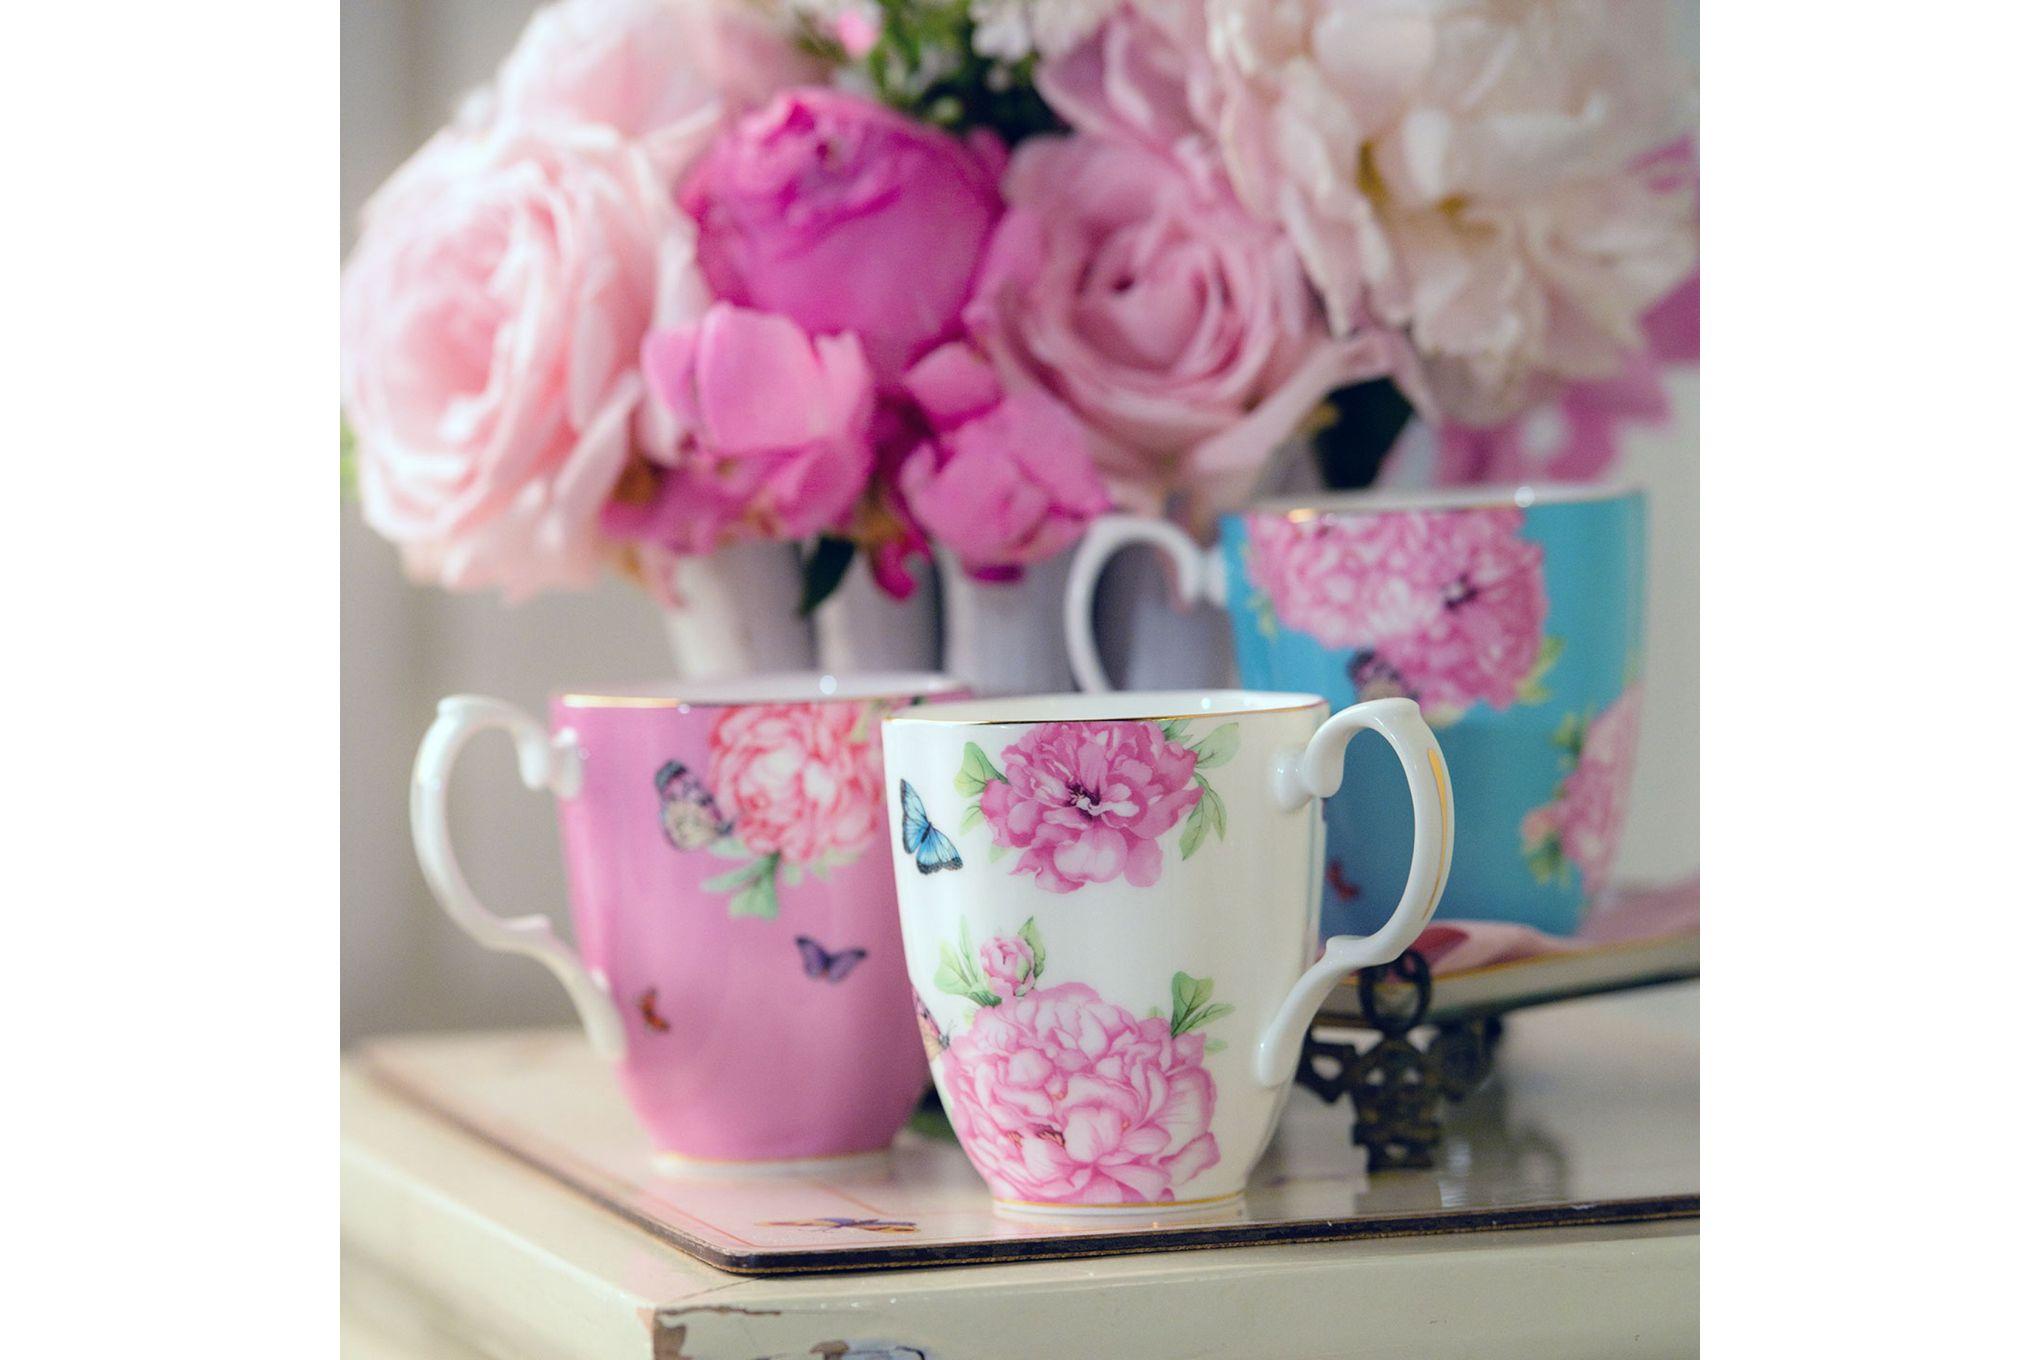 Miranda Kerr for Royal Albert Friendship Mug Turquoise 0.4l thumb 4